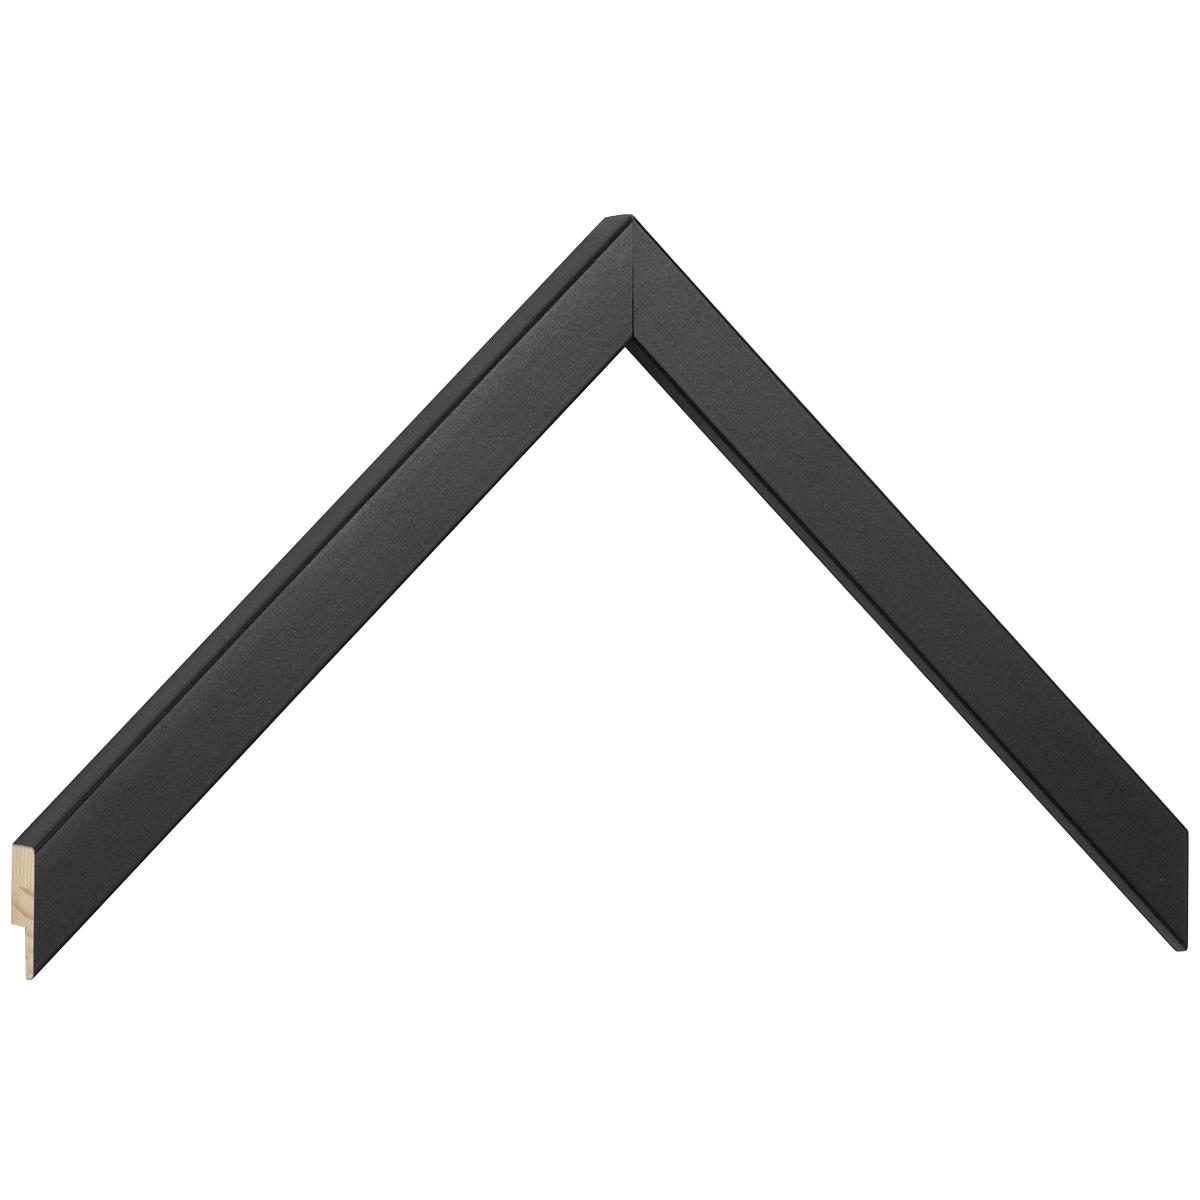 Moulding ayous width 15mm height 14 - matt black